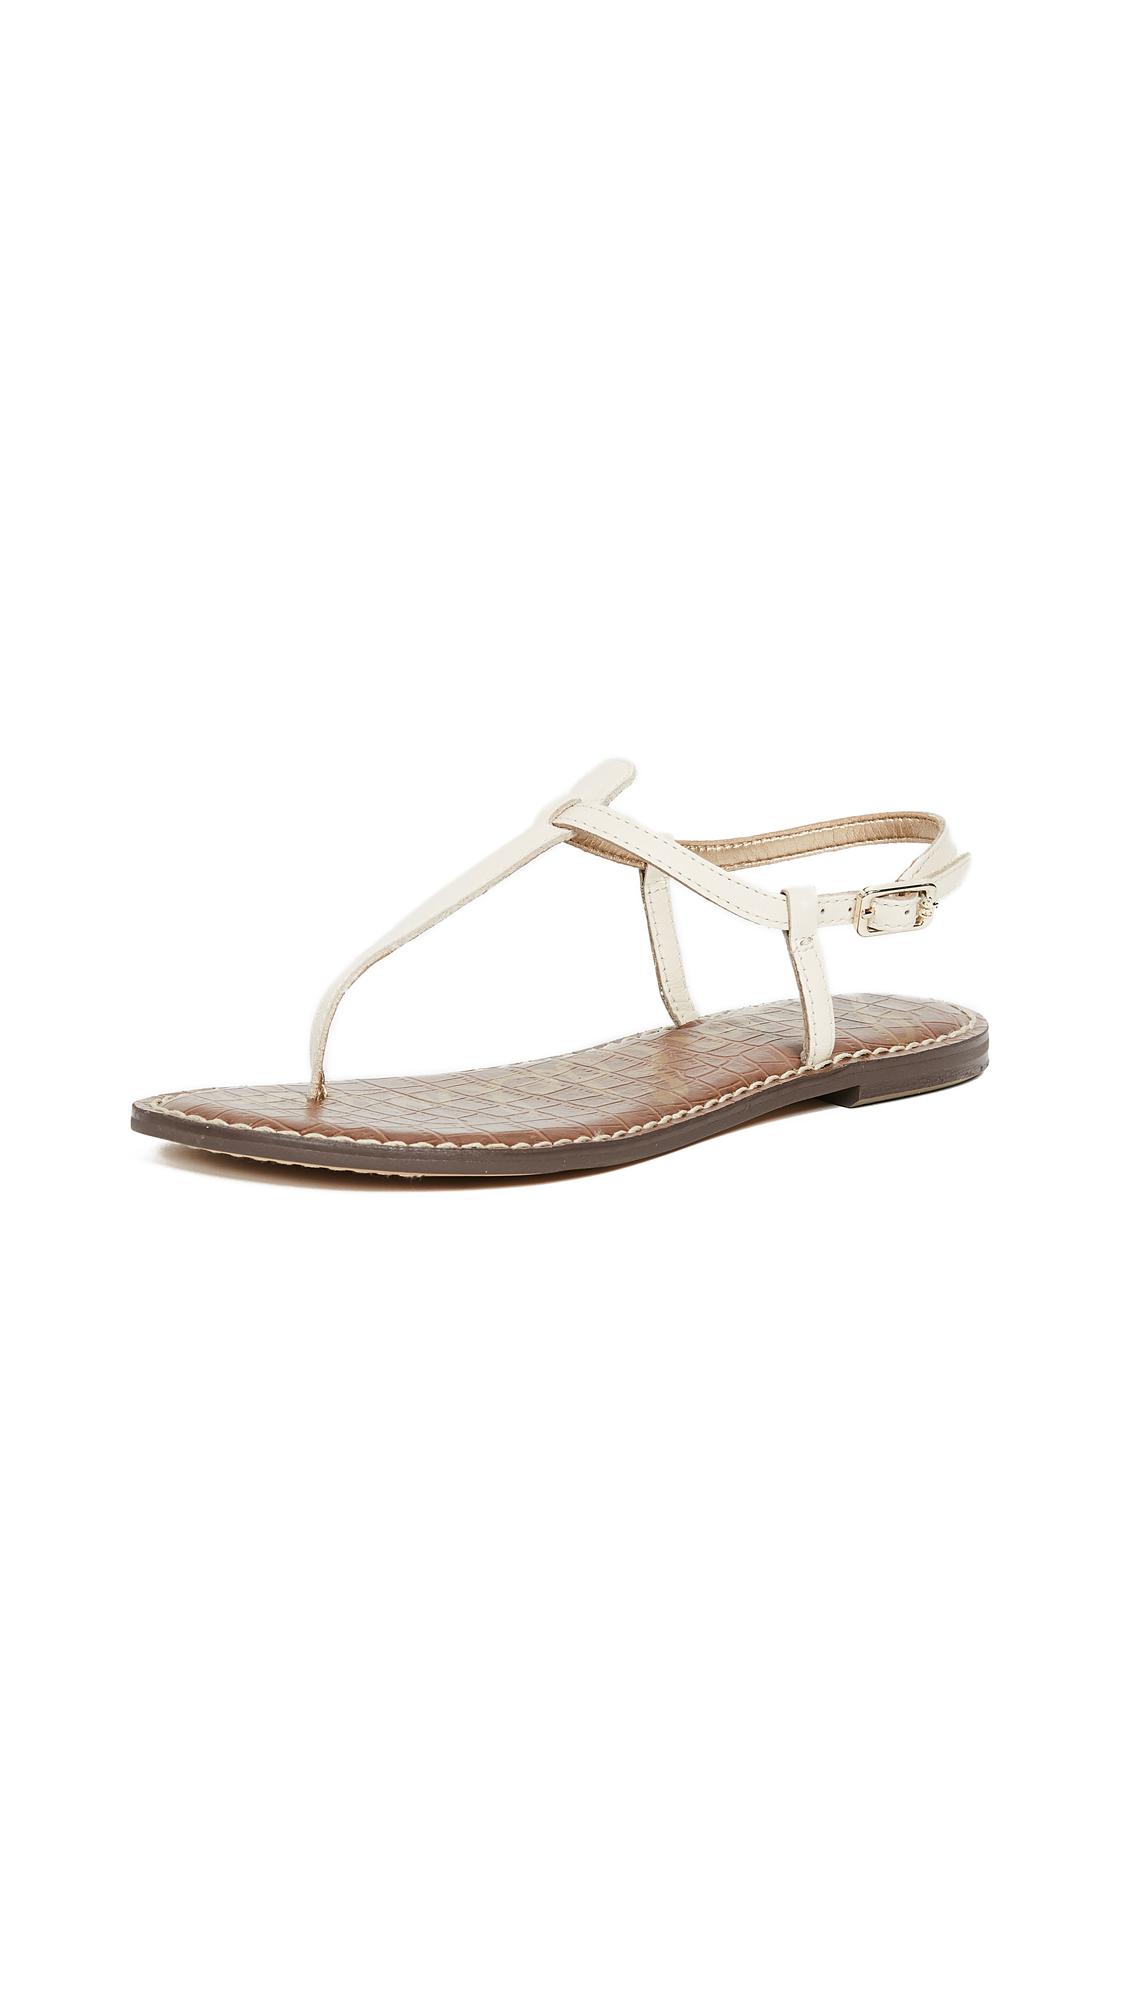 Sam Edelman Gigi Flat Sandals - Modern Ivory